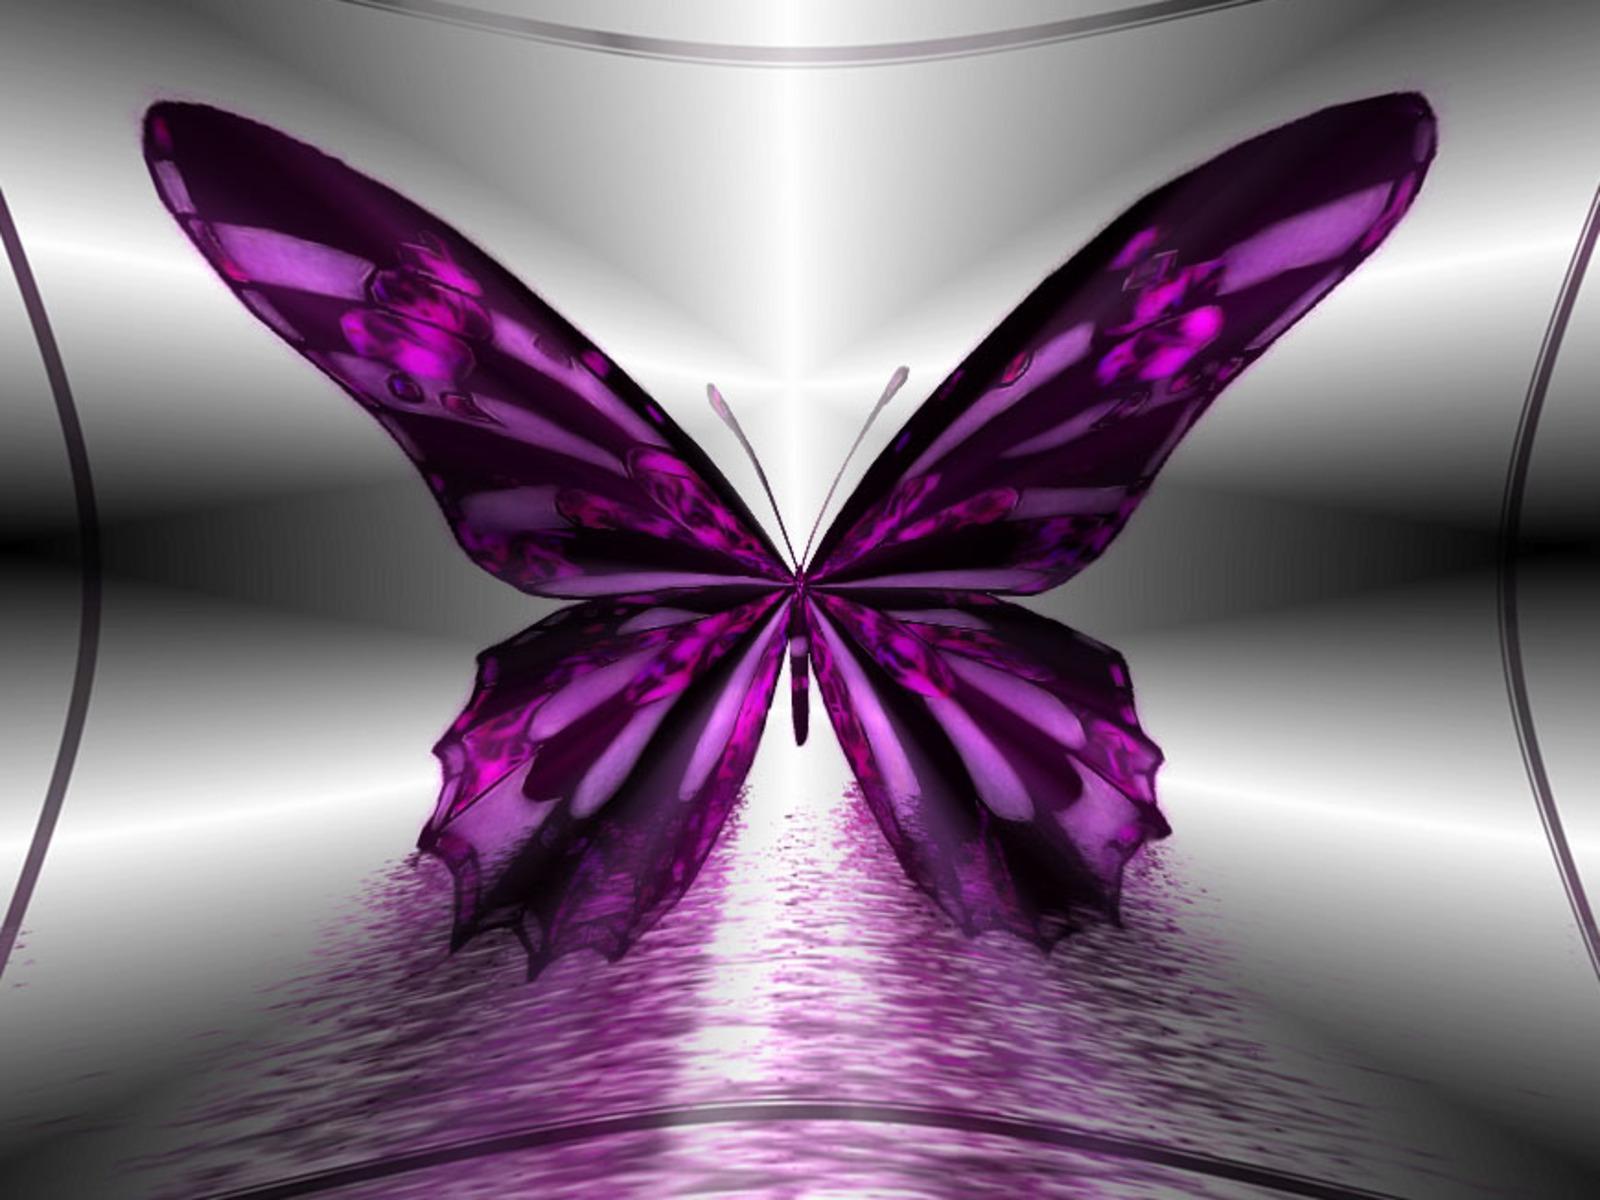 Sfondo farfalla viola sfondi hd gratis for Sfondi hd viola